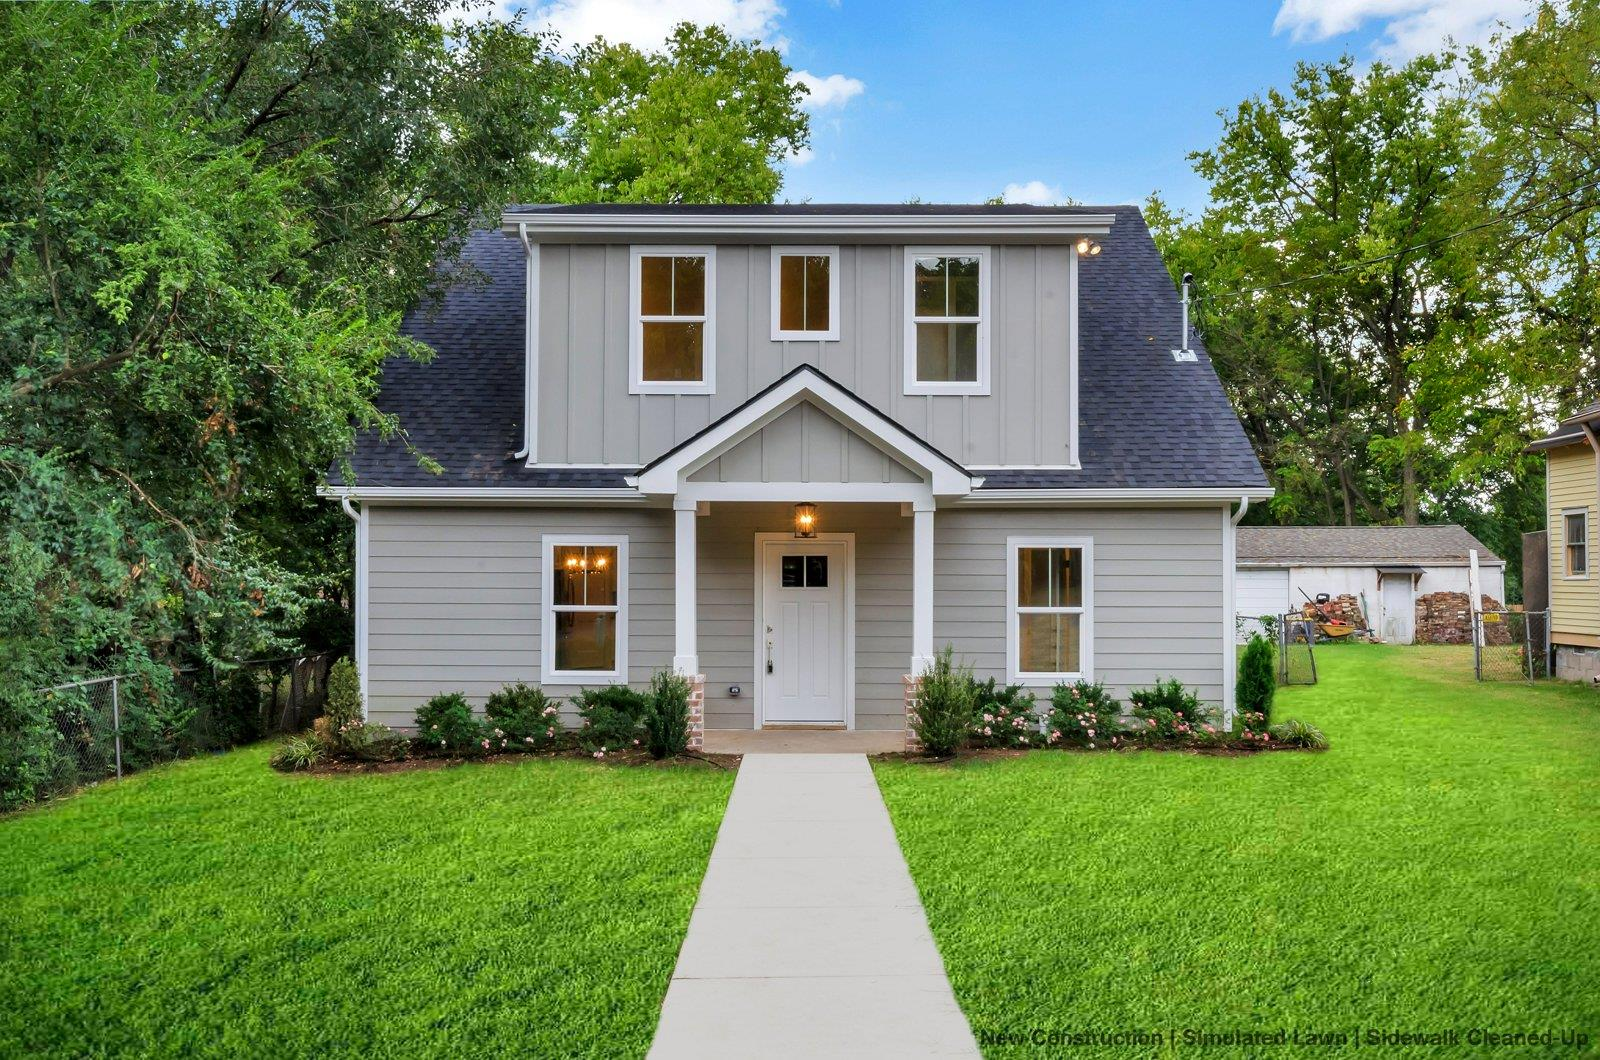 209 Lutie St, Nashville, TN 37210 - Nashville, TN real estate listing